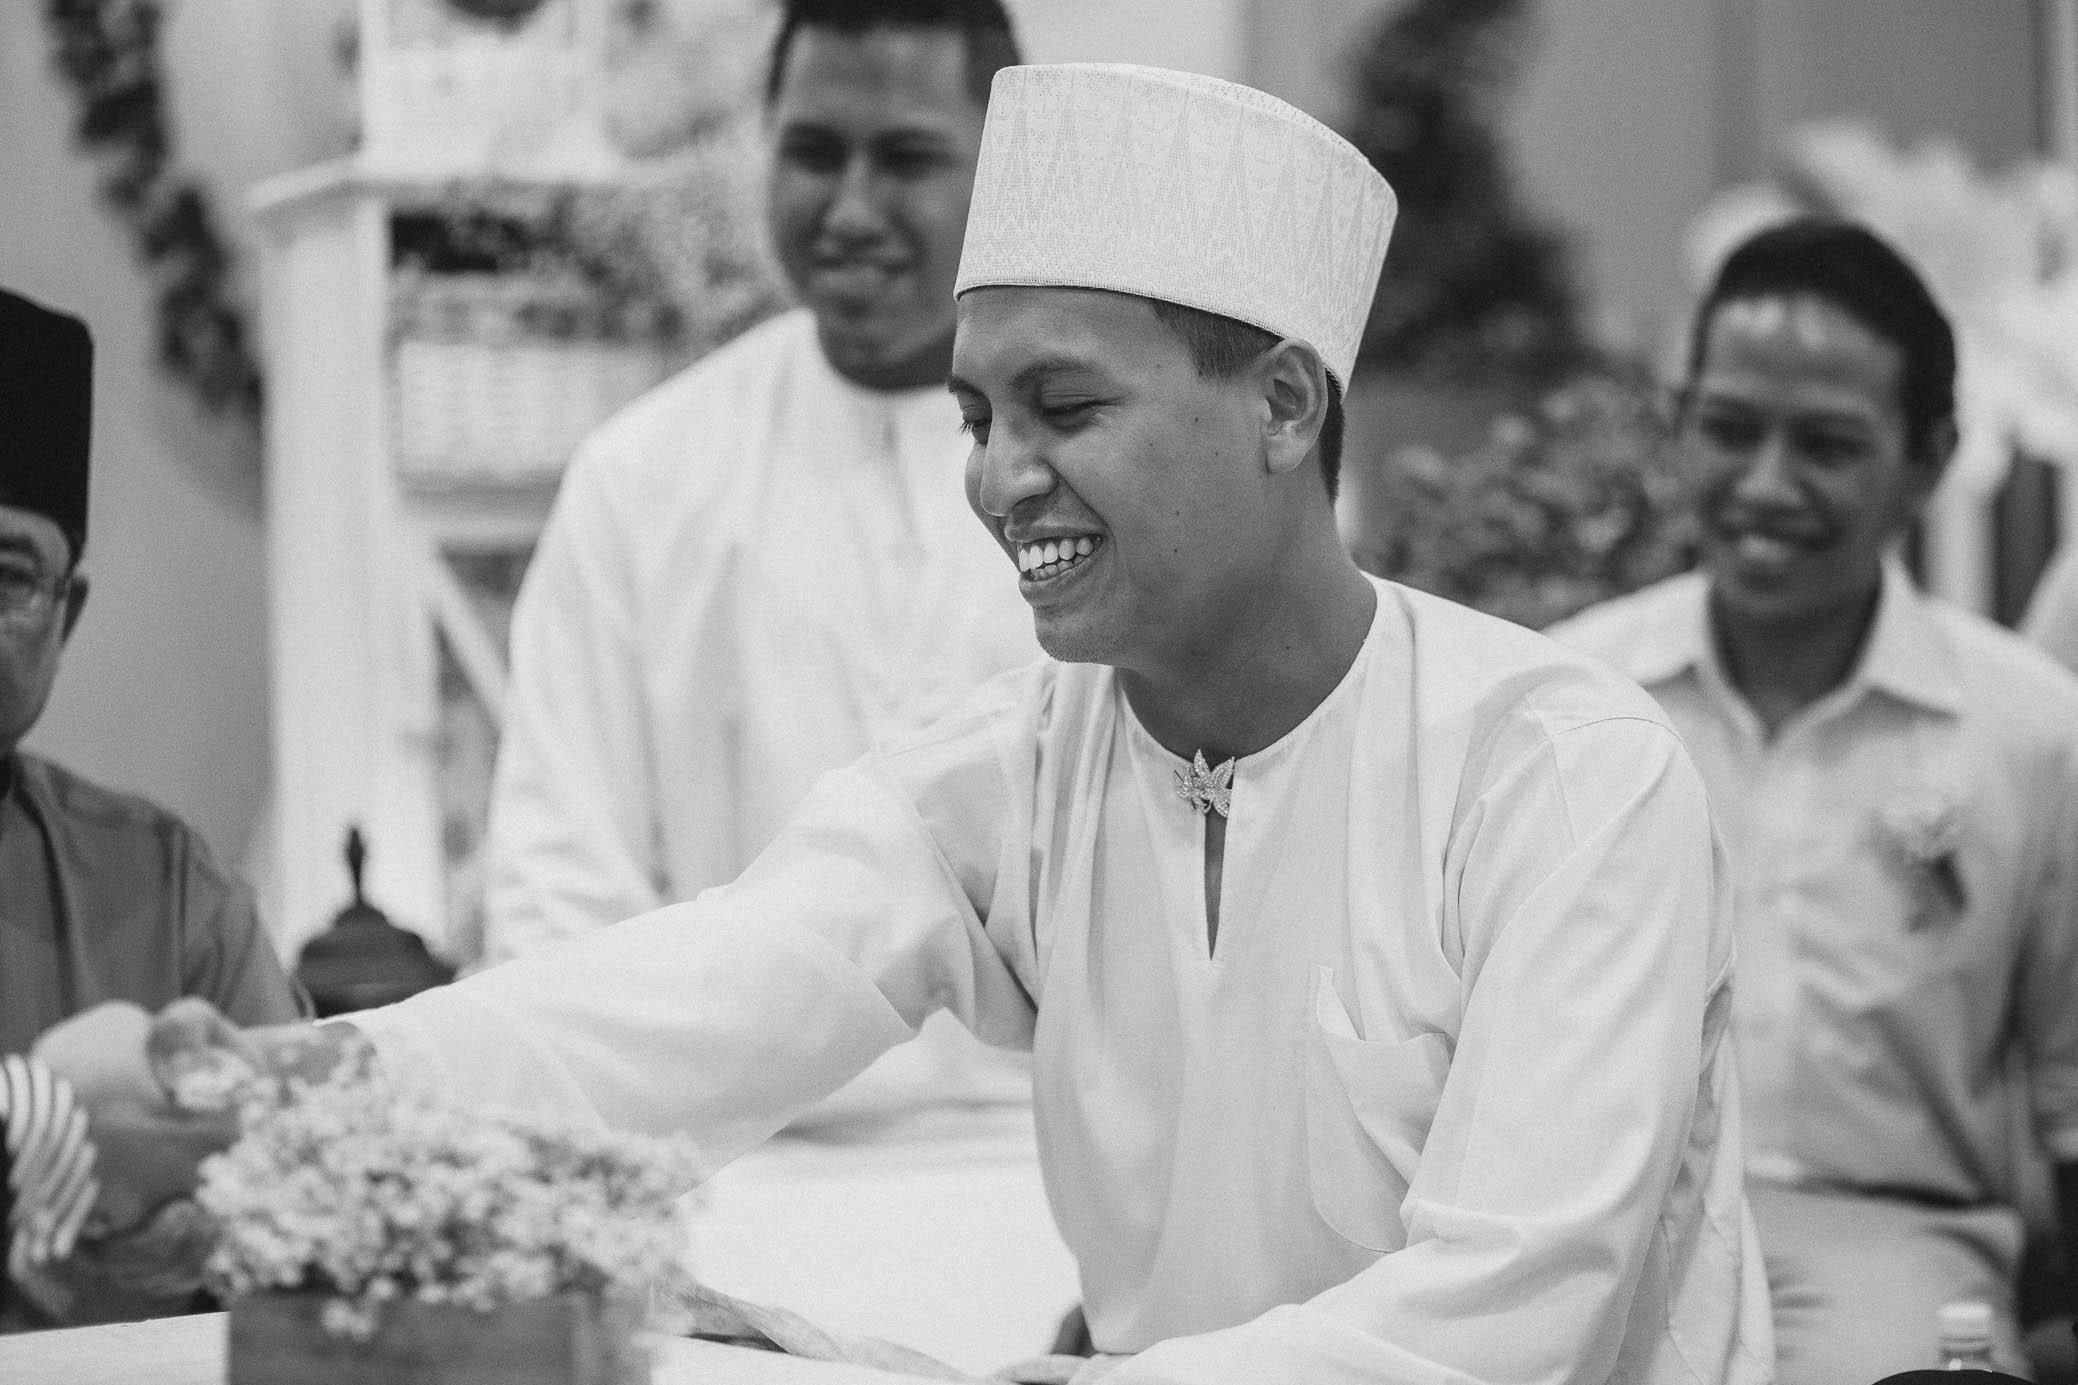 singapore-wedding-photographer-malay-indian-pre-wedding-travel-wmt-2015-alif-ethel-30.jpg